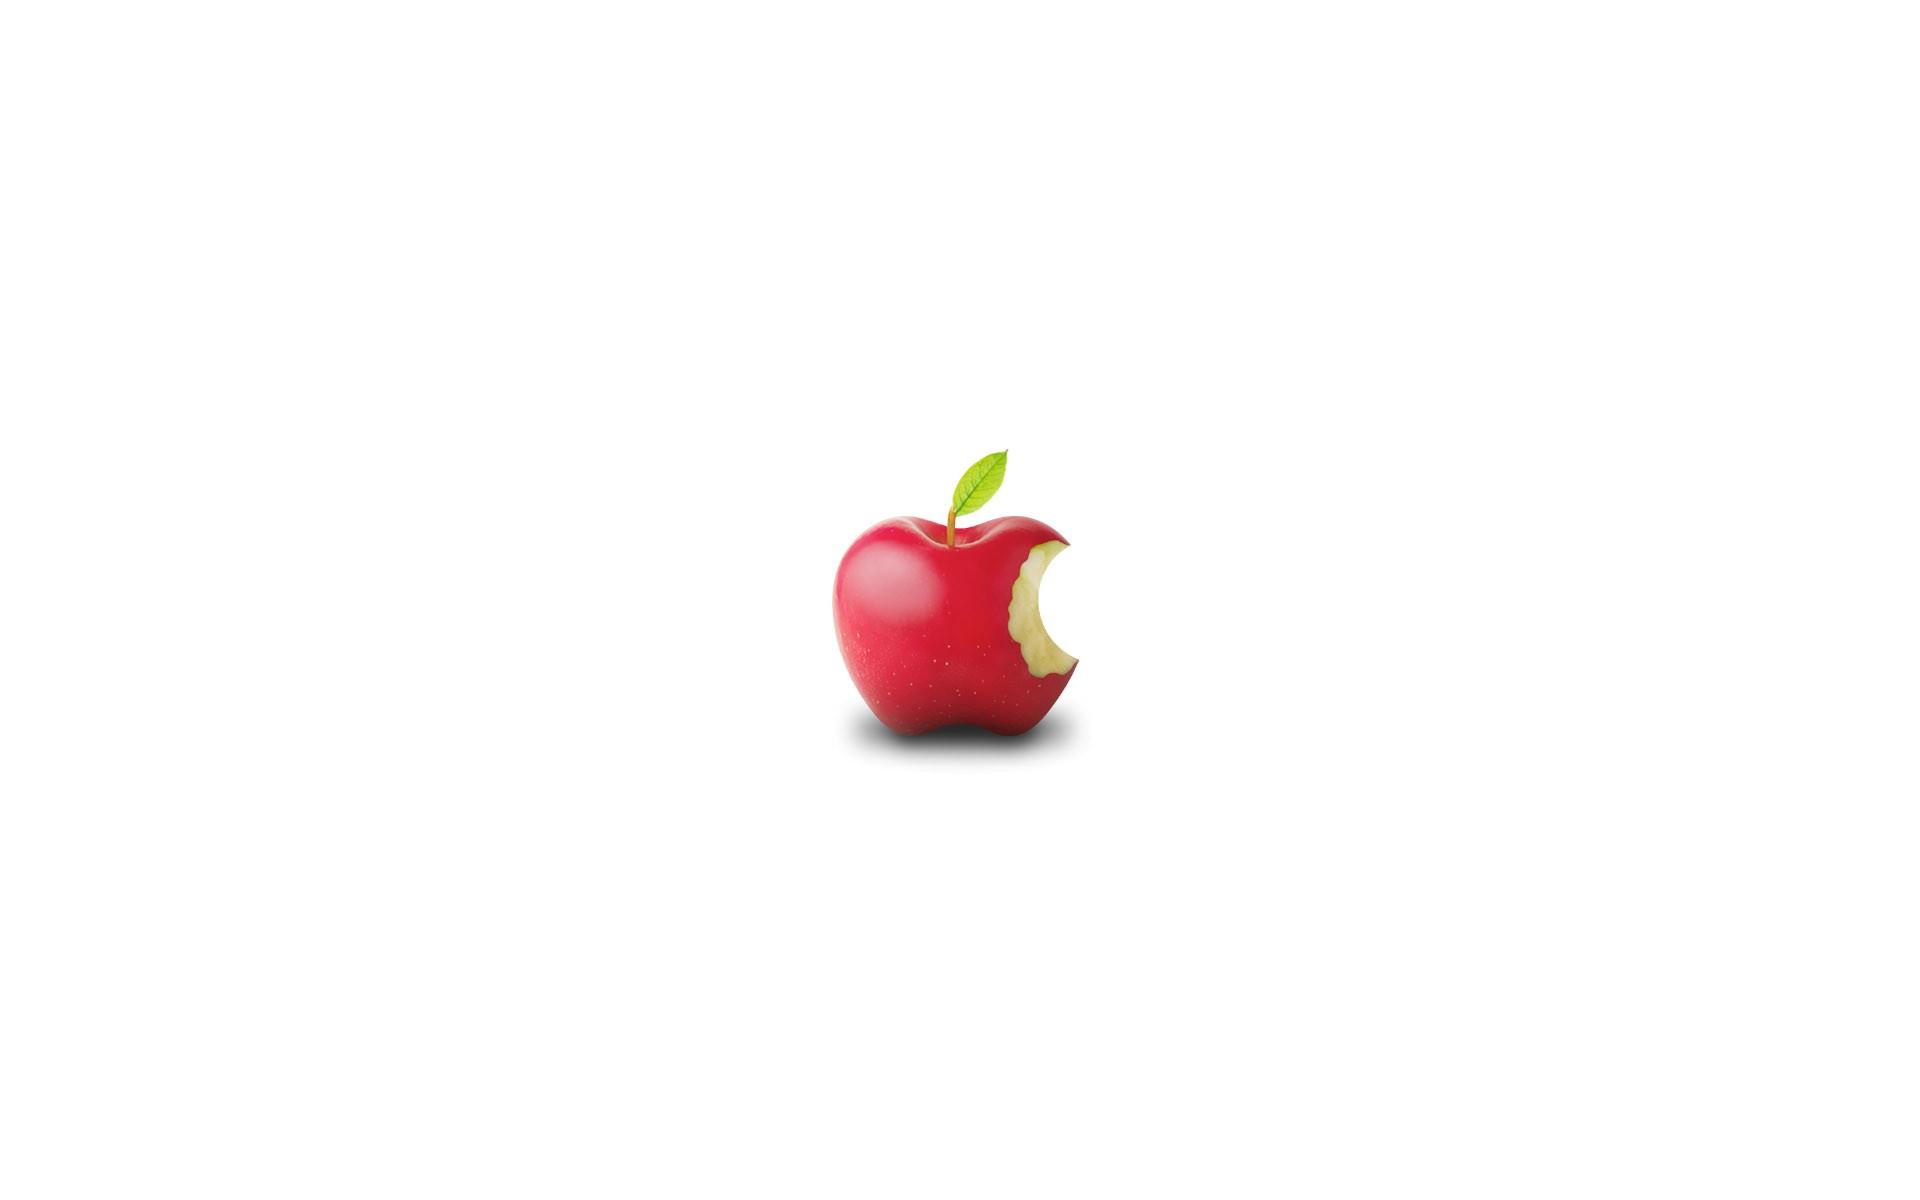 Apple Inc_ Mac Logos White Background Wallpaper 1920x1200 184020 Wallpaperup